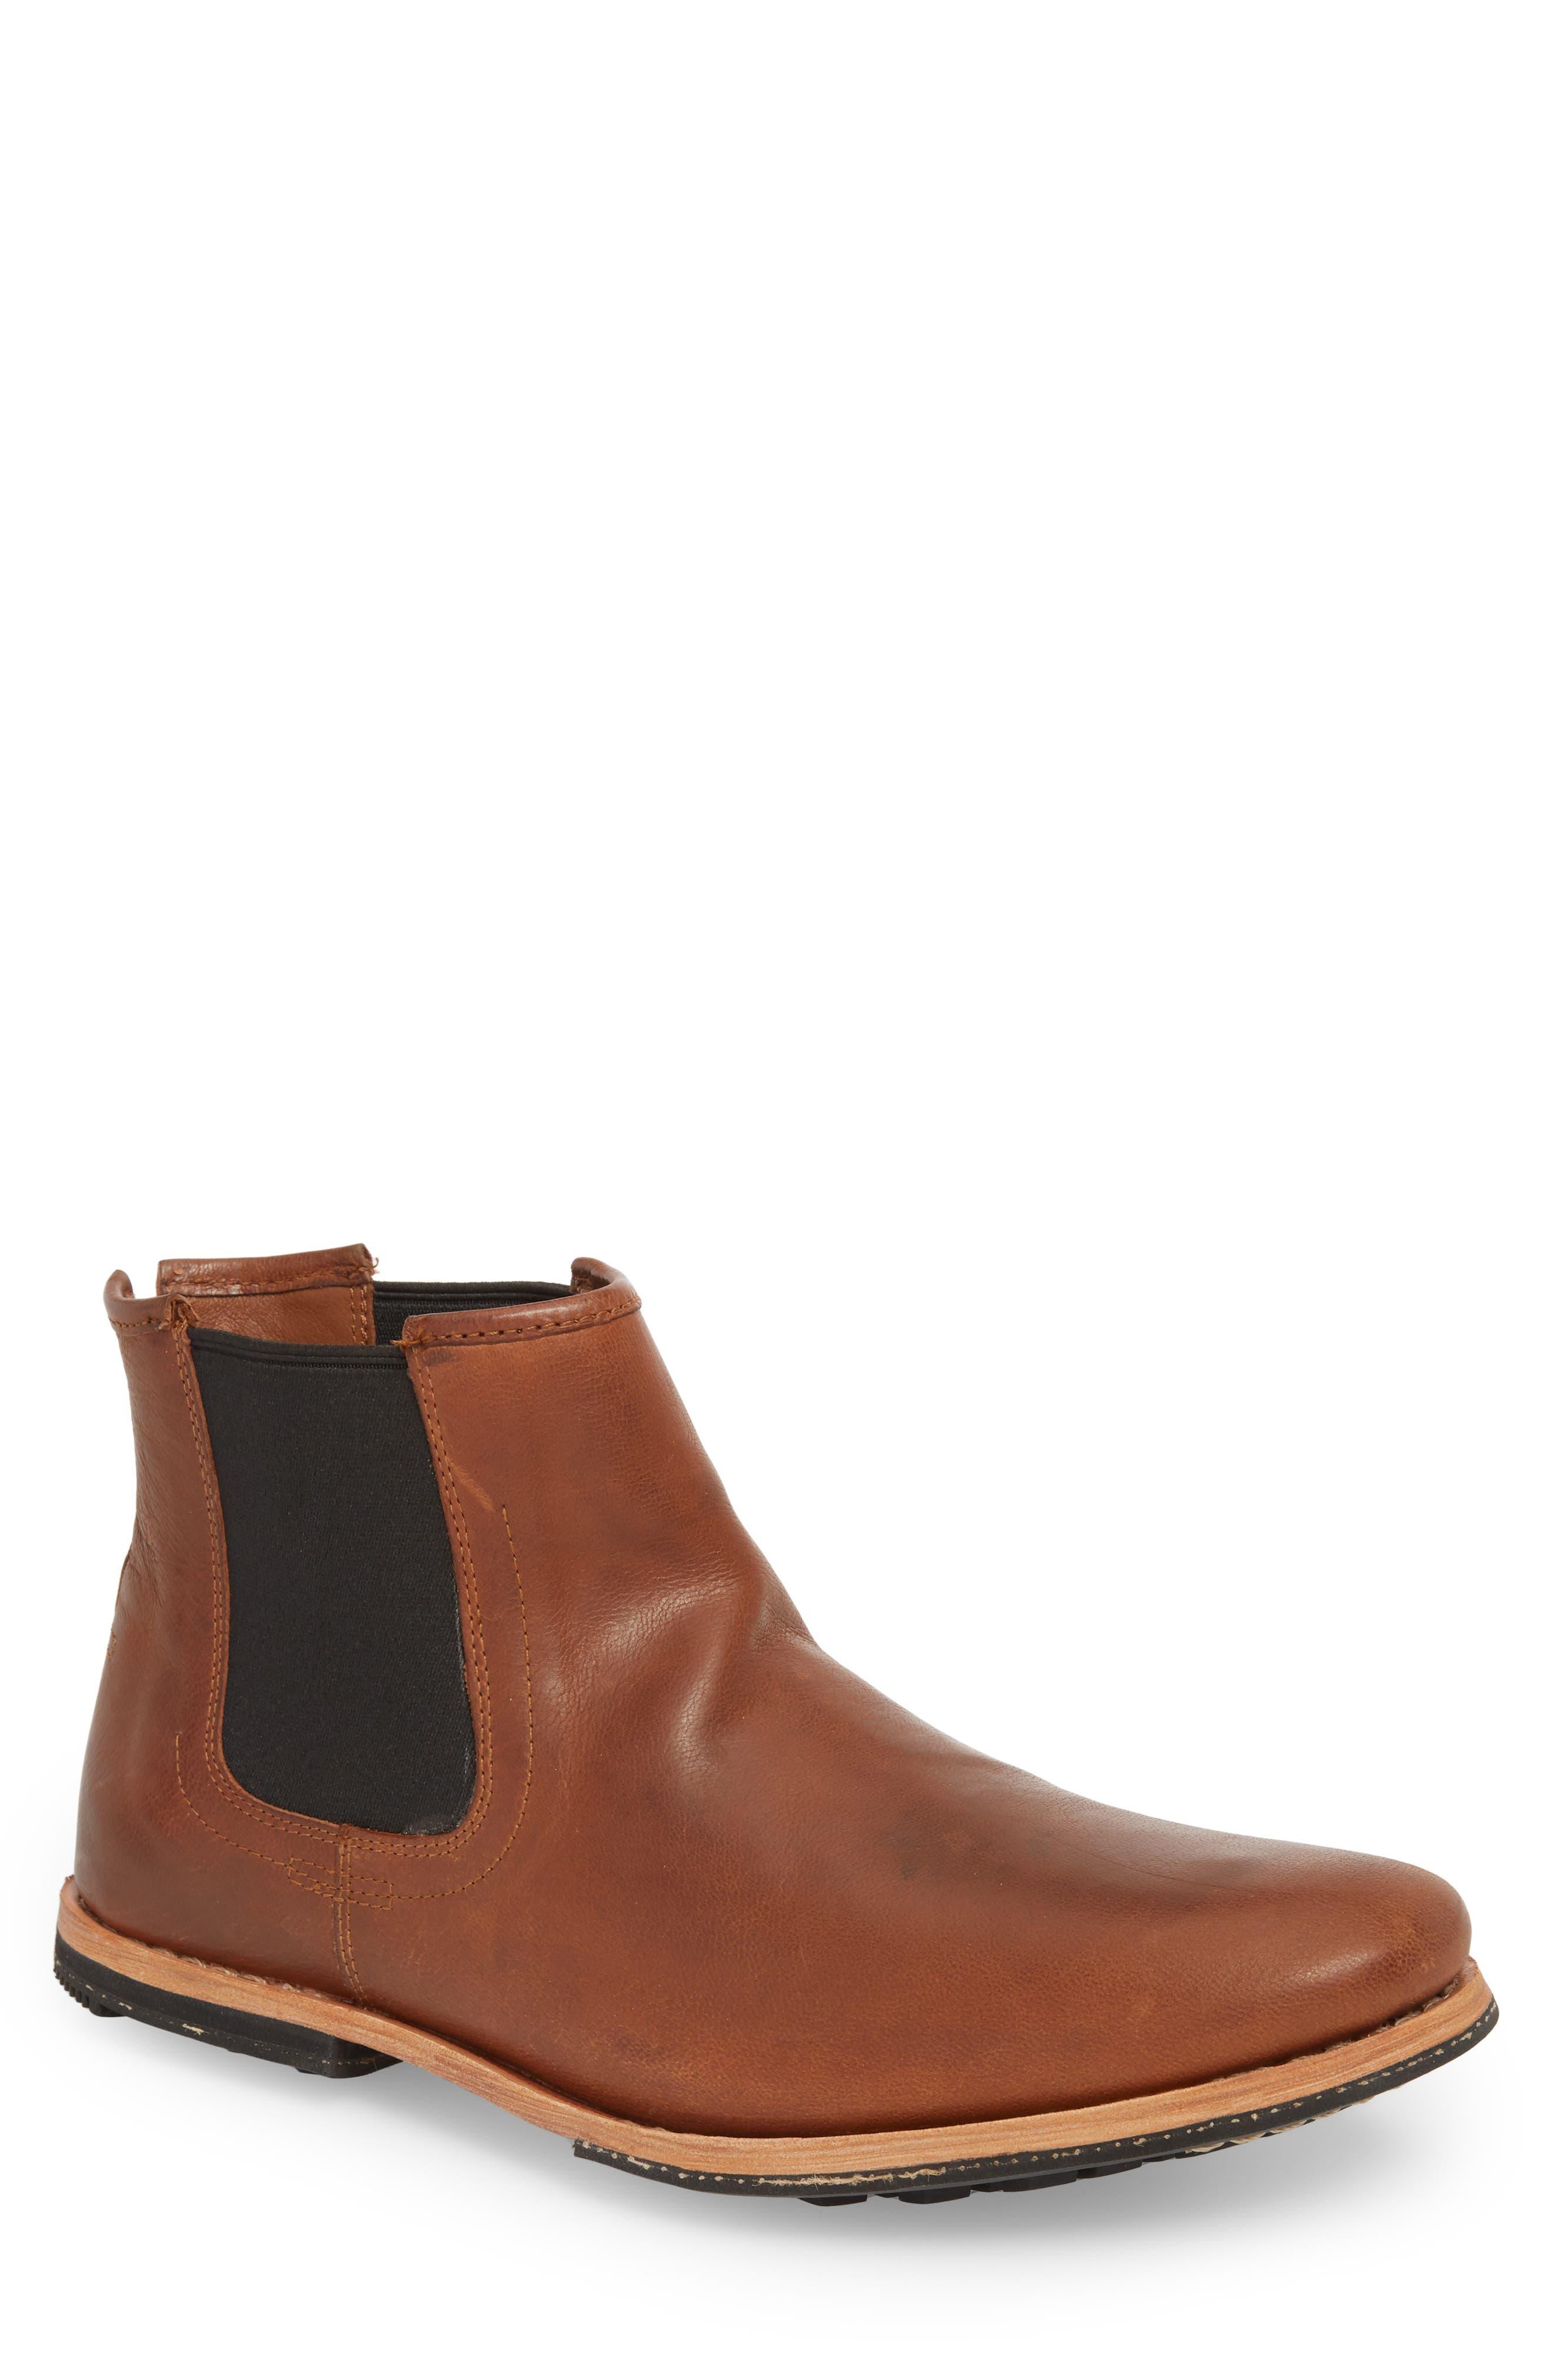 Wodehouse History Chelsea Boot,                         Main,                         color, Medium Brown